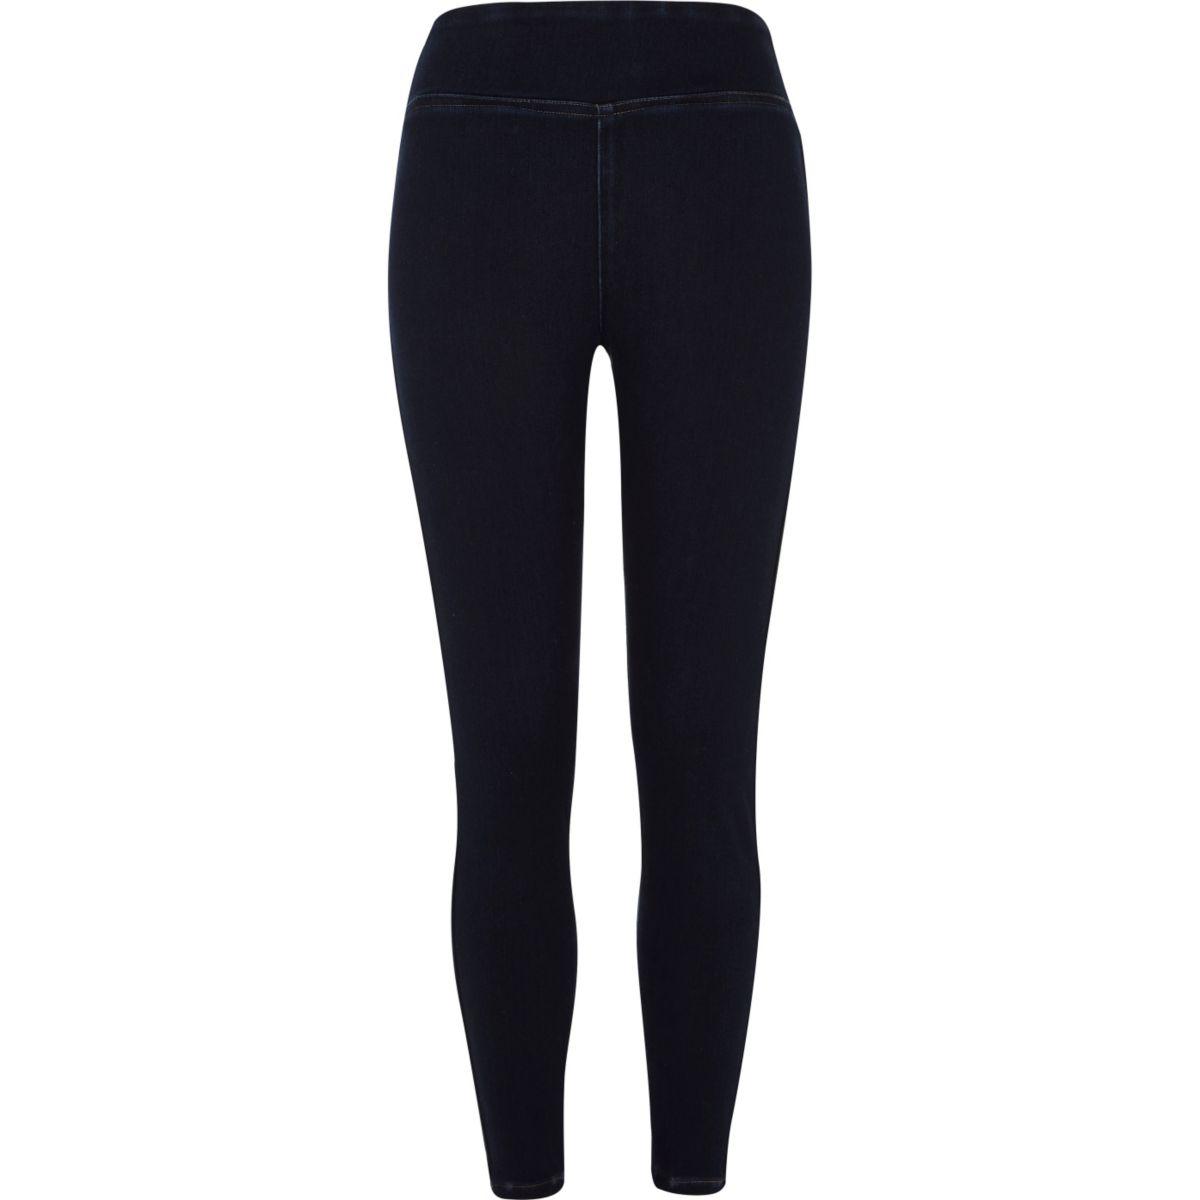 Dark blue wash denim leggings